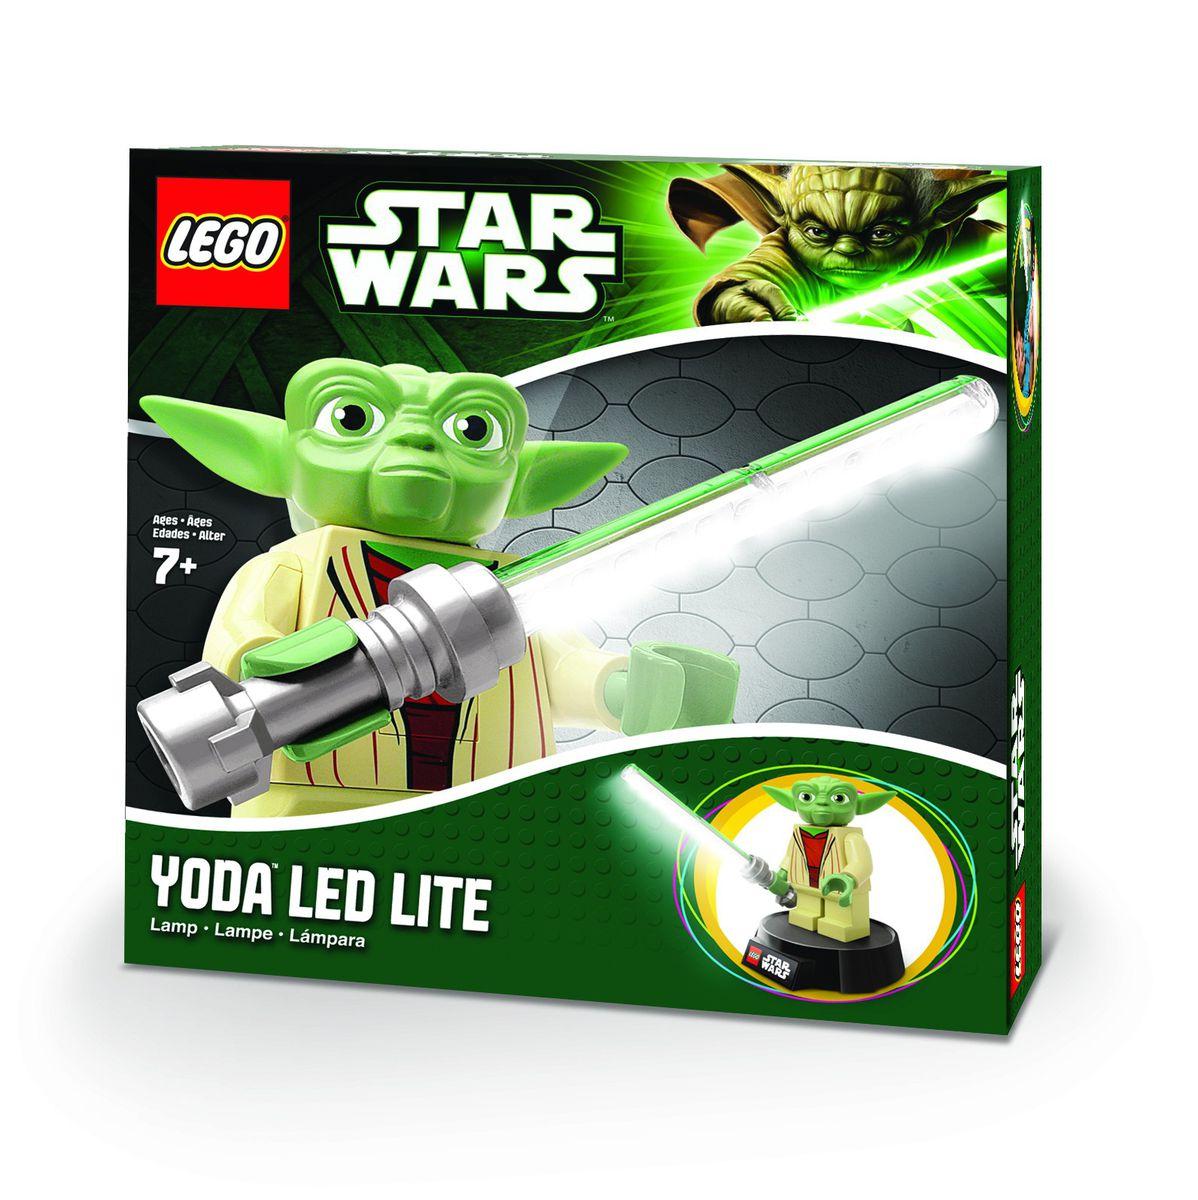 Led night light south africa -  Lego Star Wars Yoda Torch Night Light